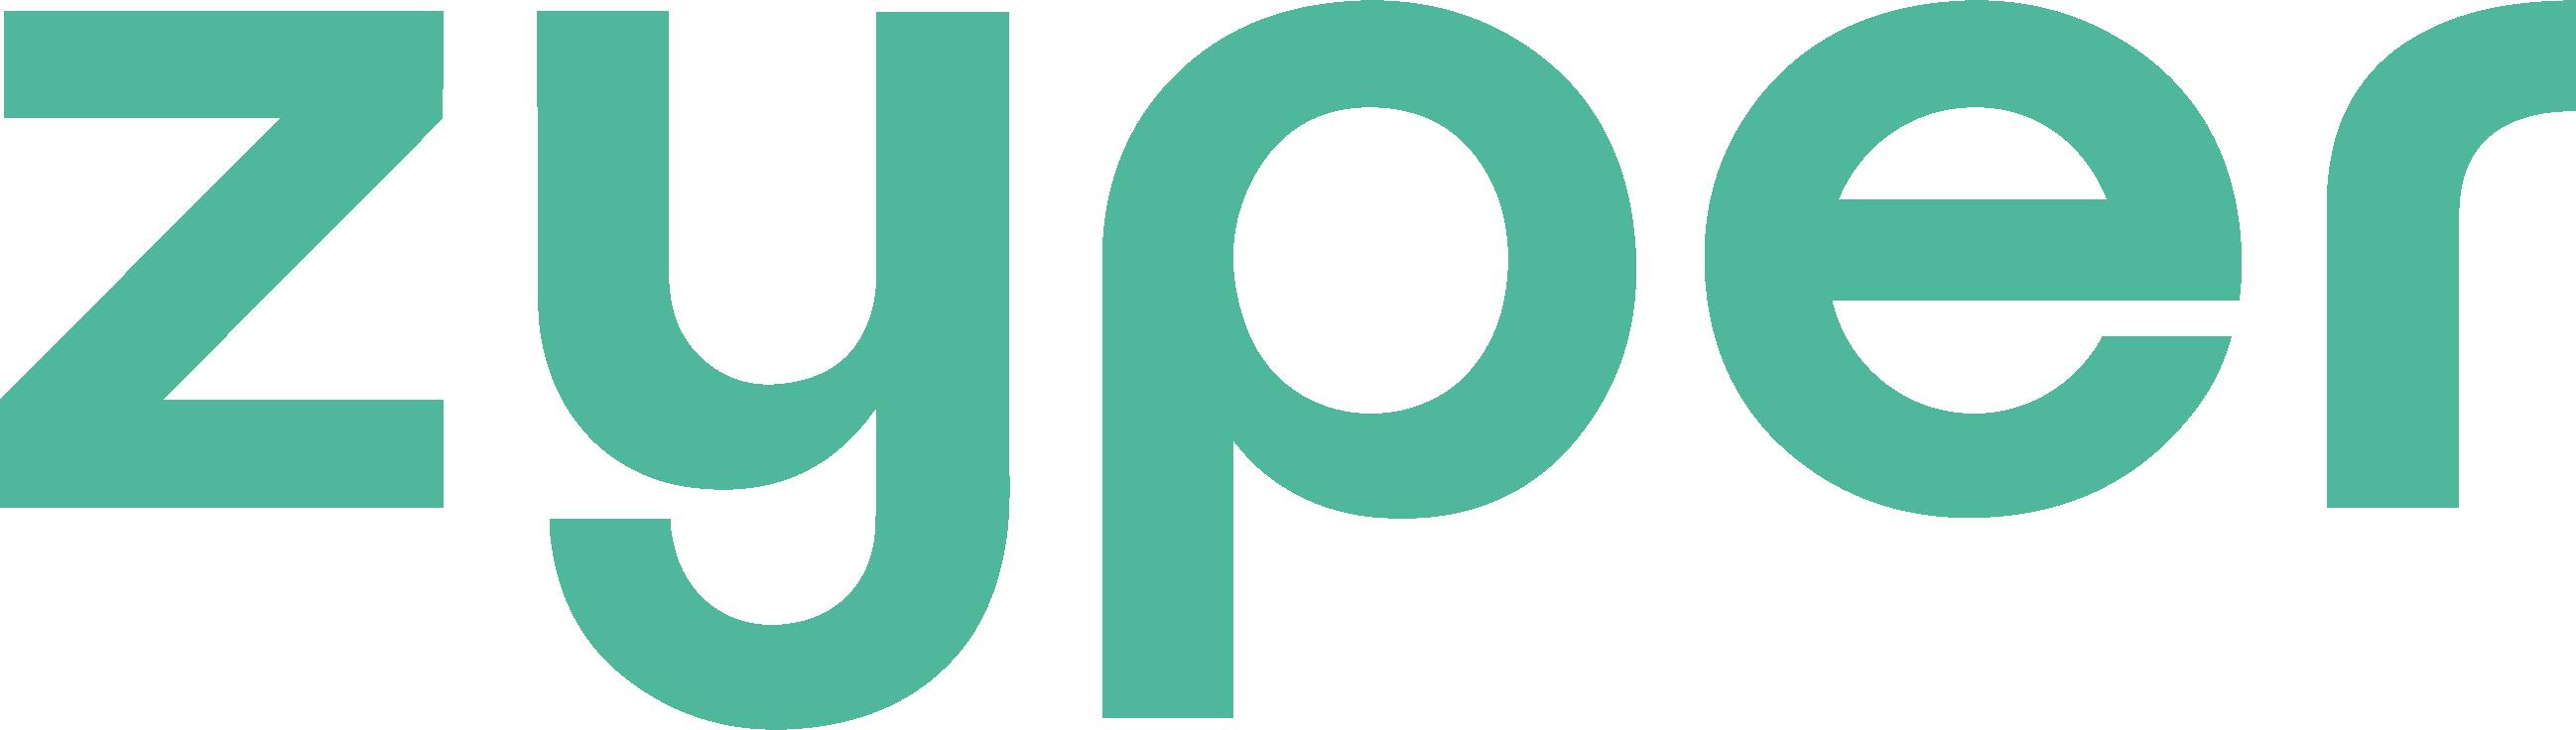 Zyper logo